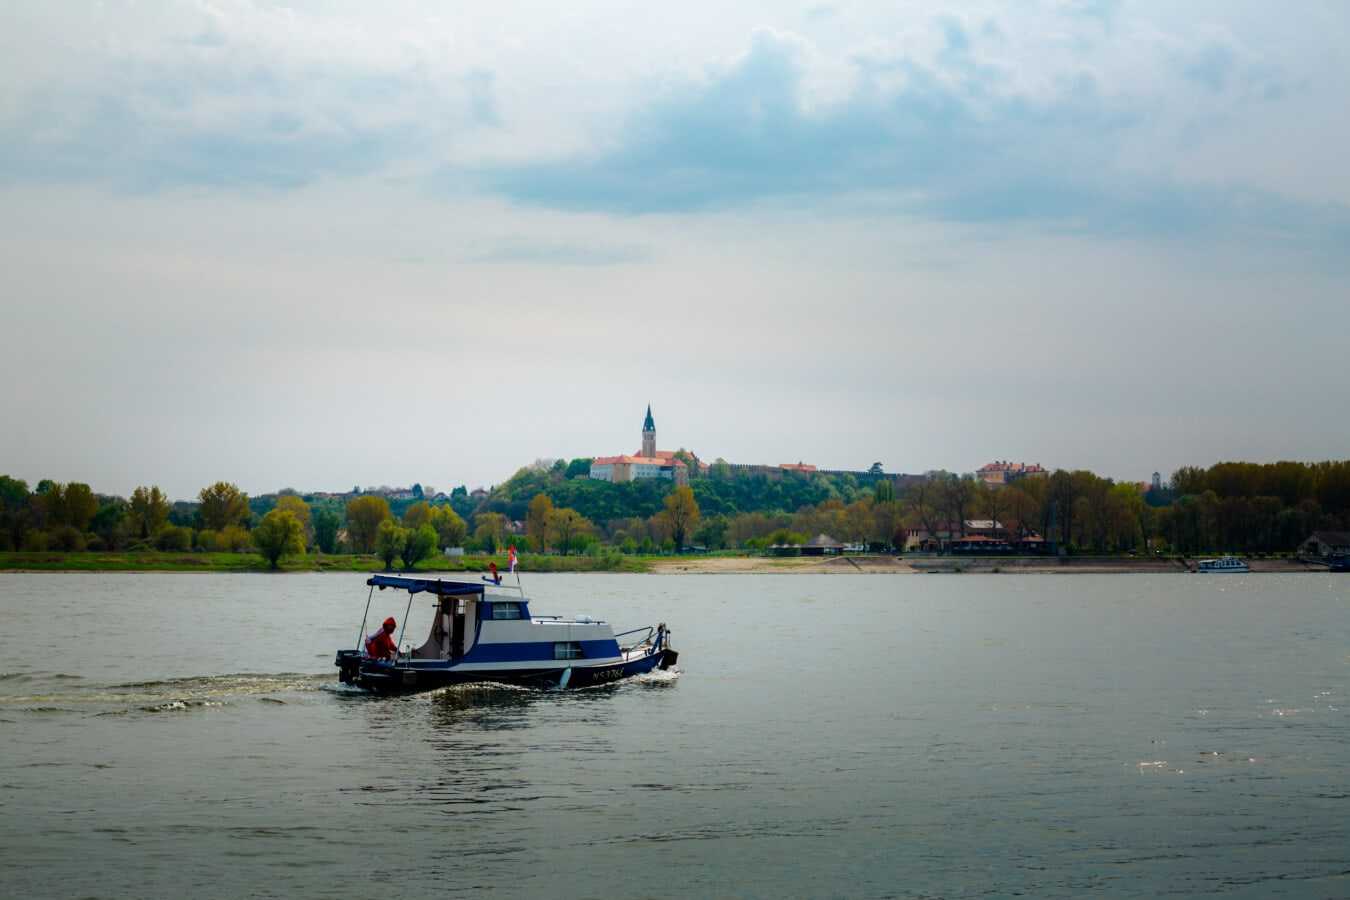 Motorboot, Fischer, Angelboot/Fischerboot, Kreuzfahrt, Transport, Reisen, Reise, Reisende, Erholung, Fluss